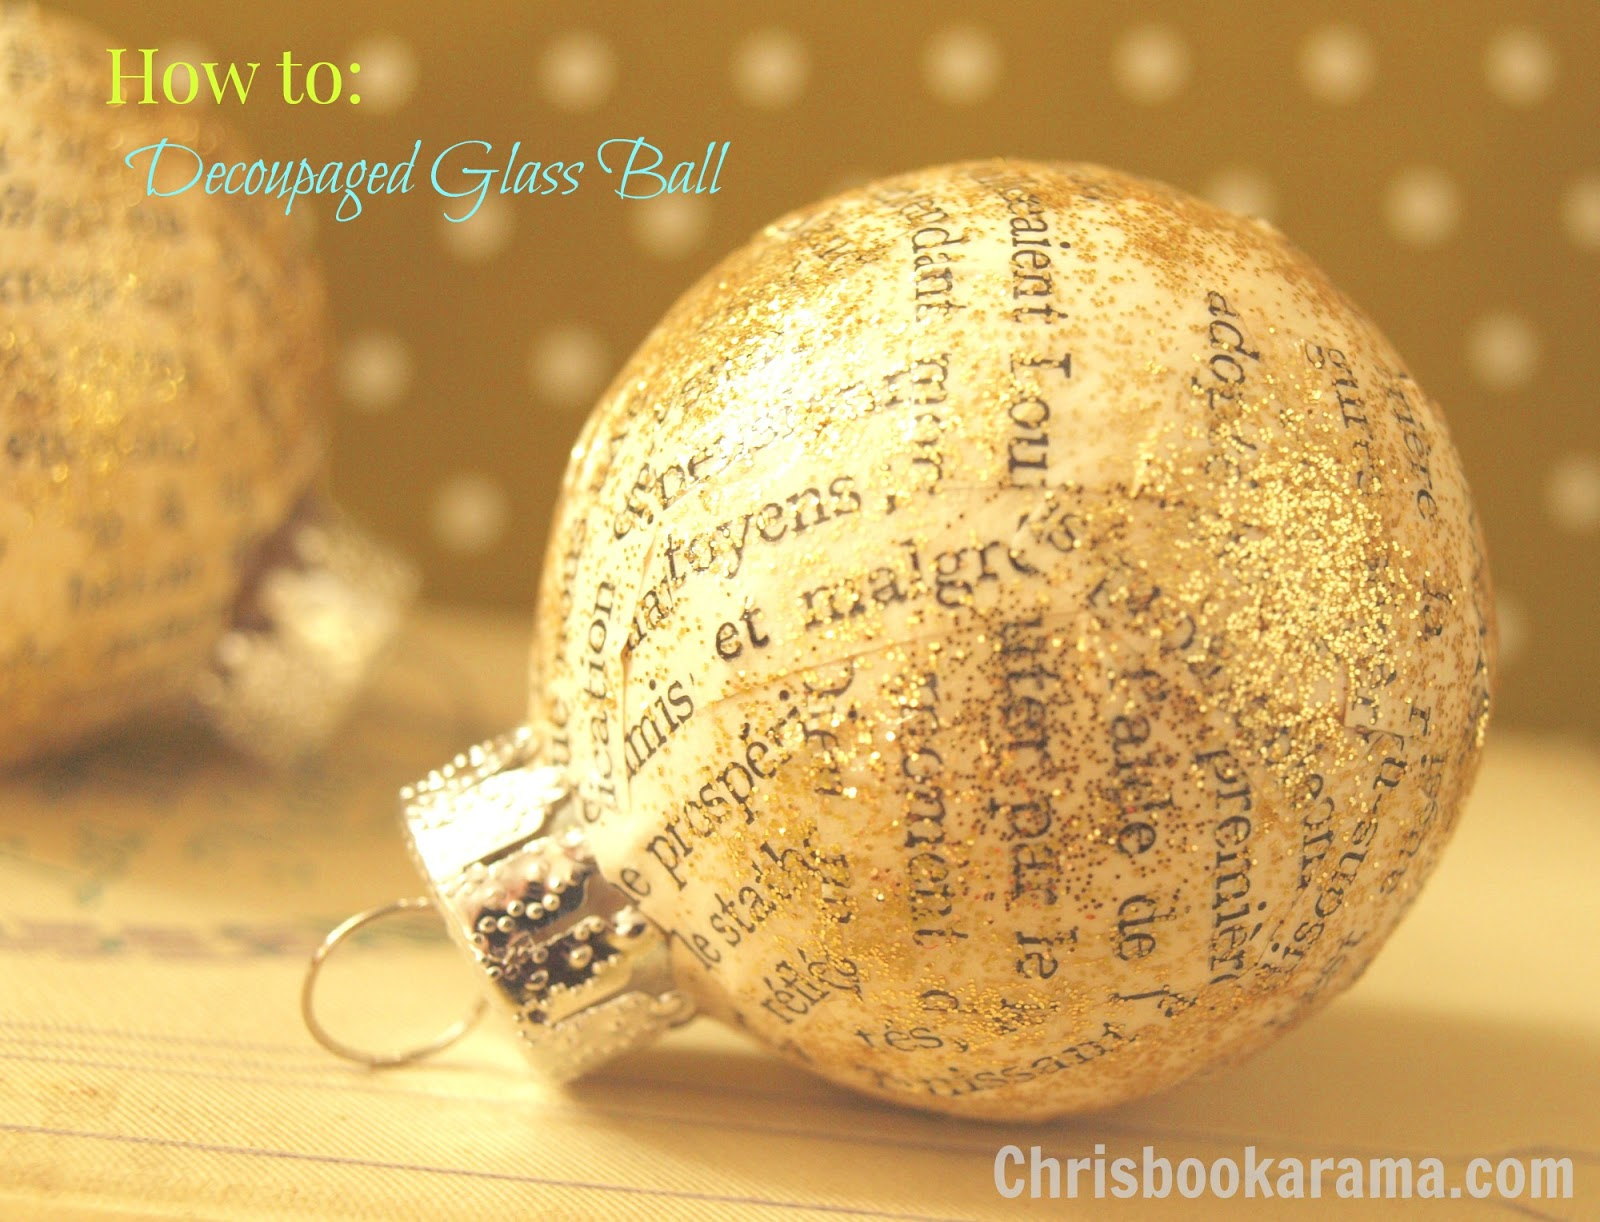 Decoupaged Glass Ball by Chrisbookarama.com